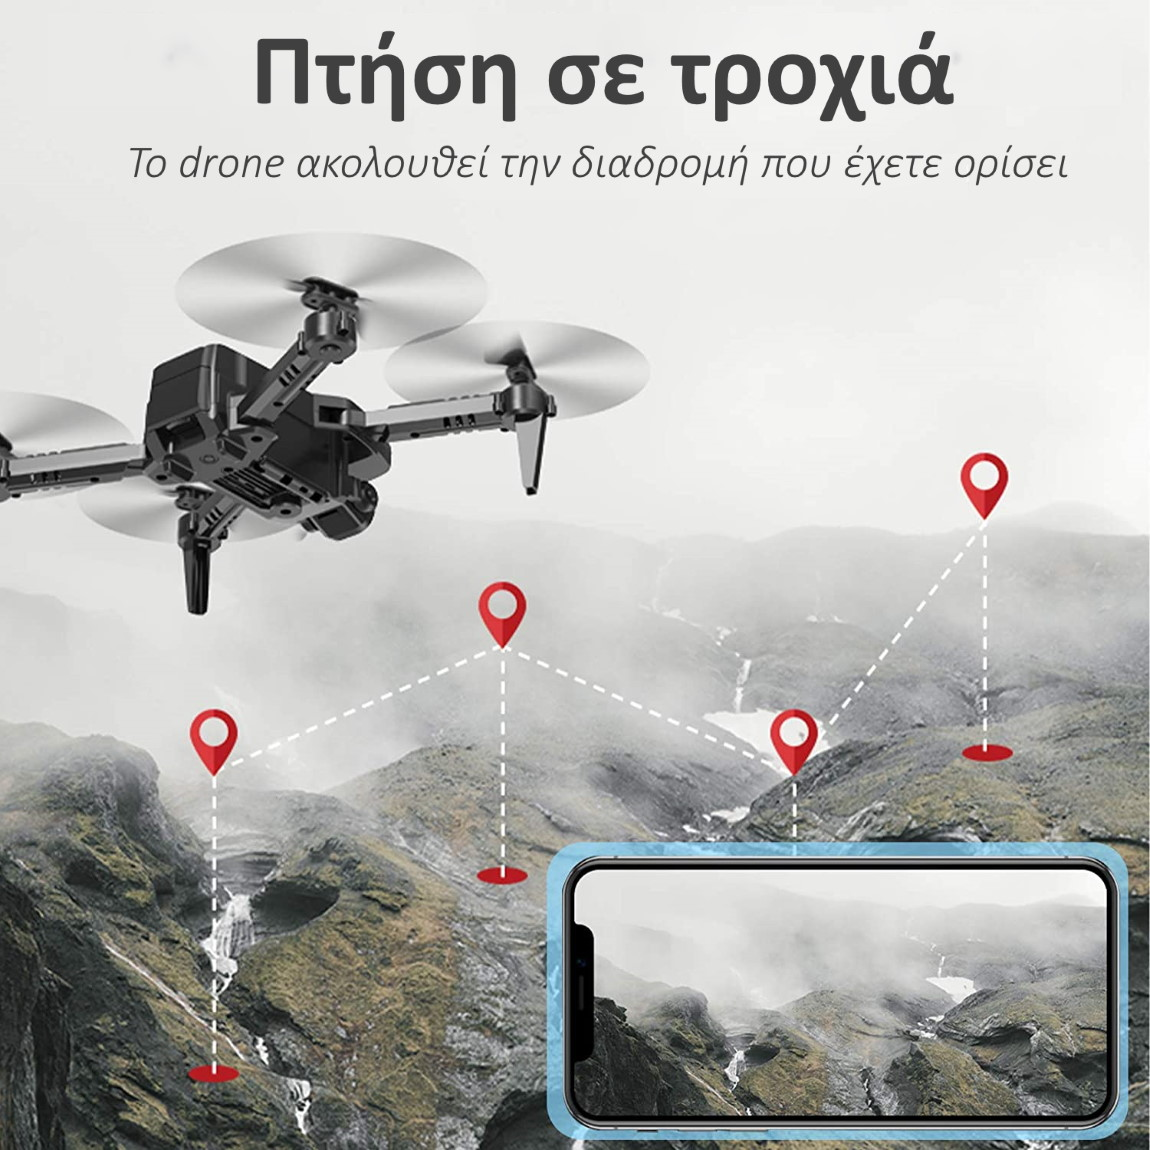 ToySky S171 Αναδιπλούμενο Mini Drone Quadcopter καθορισμός πορείας πτήσης